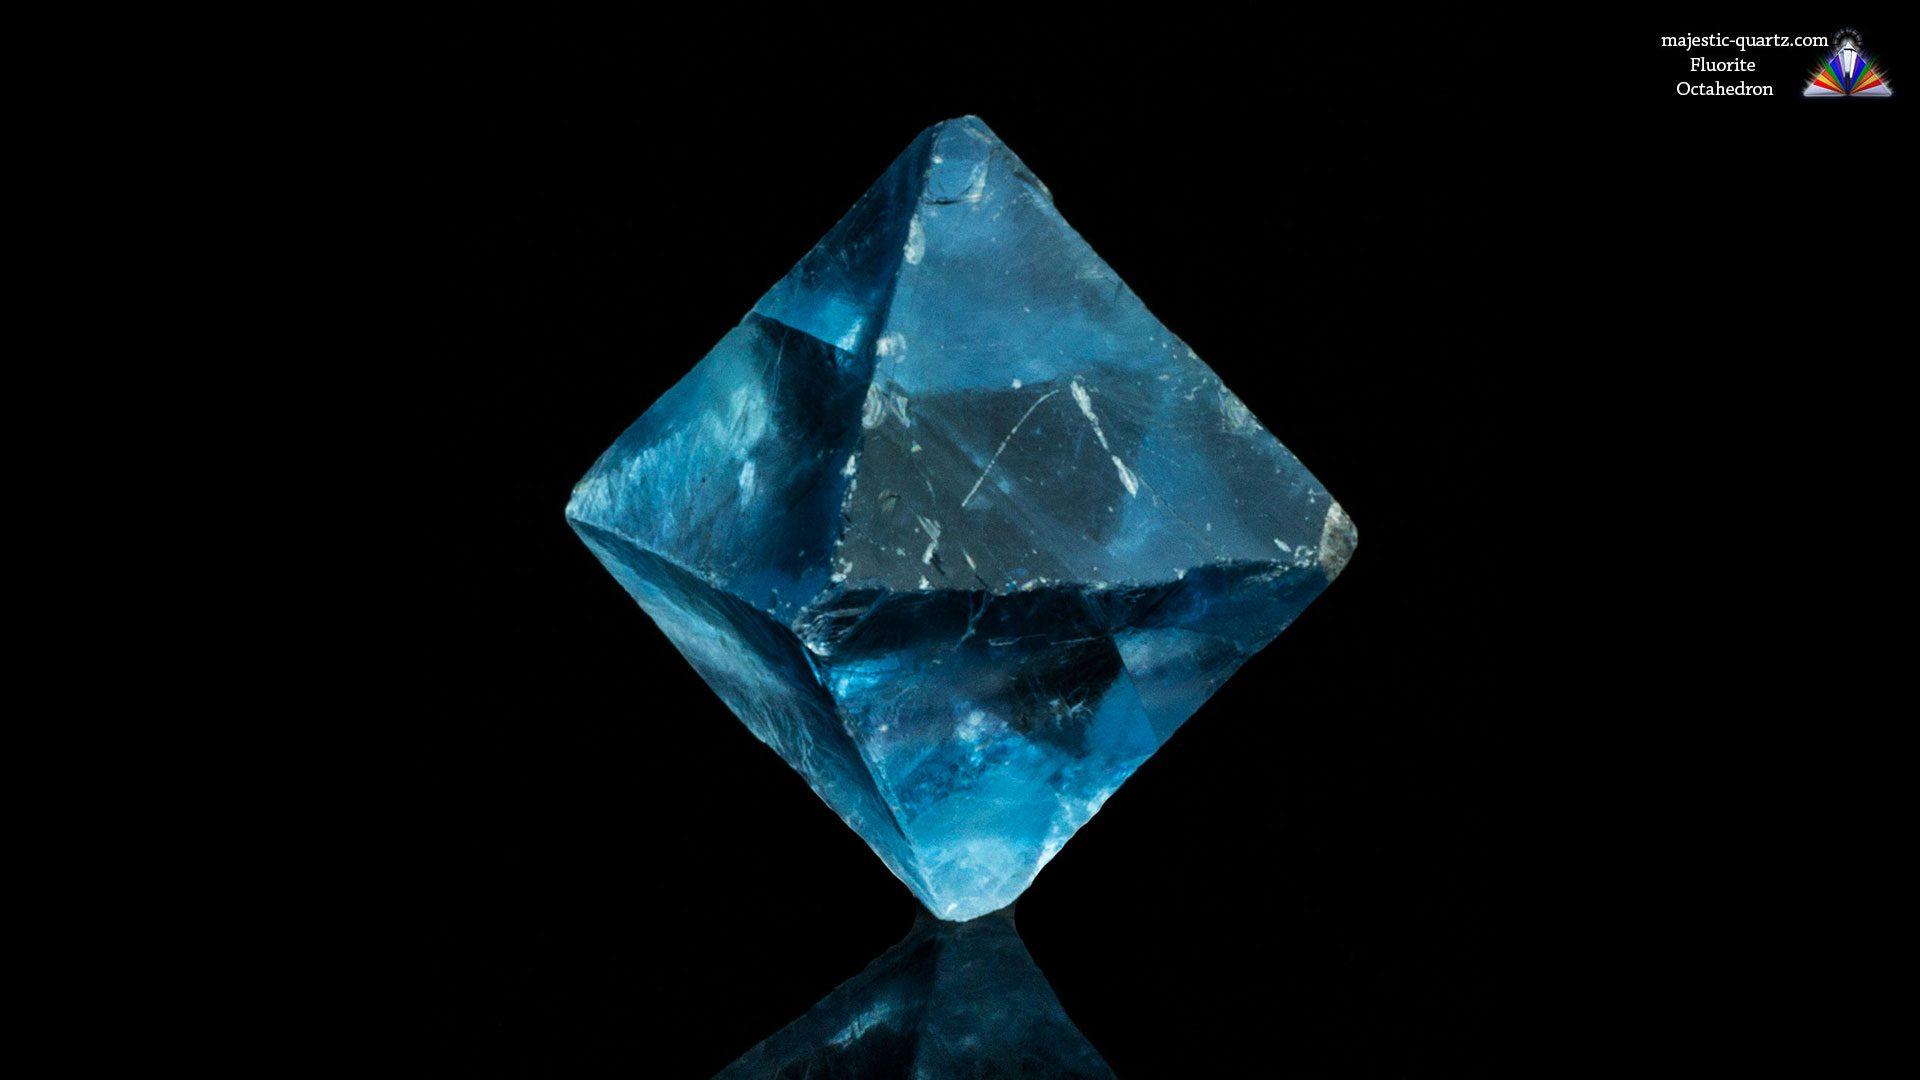 Fluorite Octahedron Crystal Specimen - Mineral Specimen